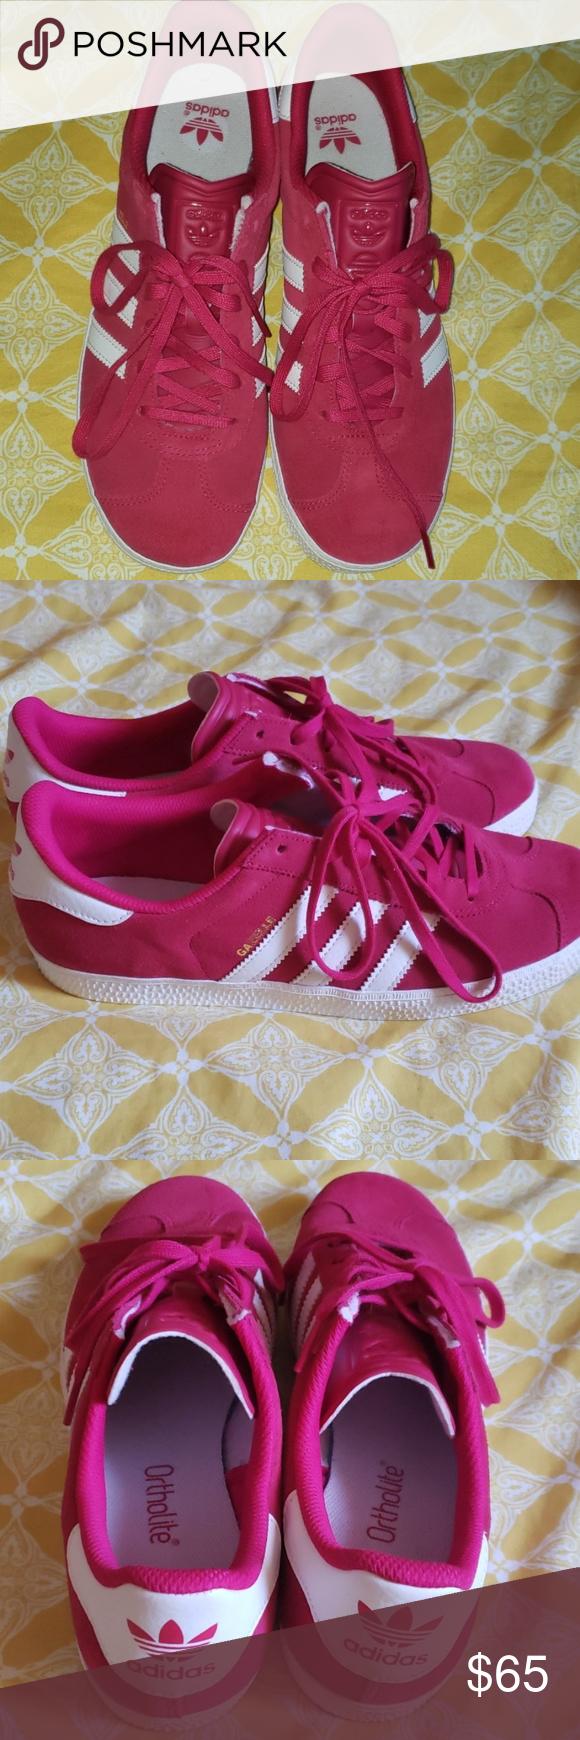 Adidas Hot Pink Gazelle   Pink gazelles